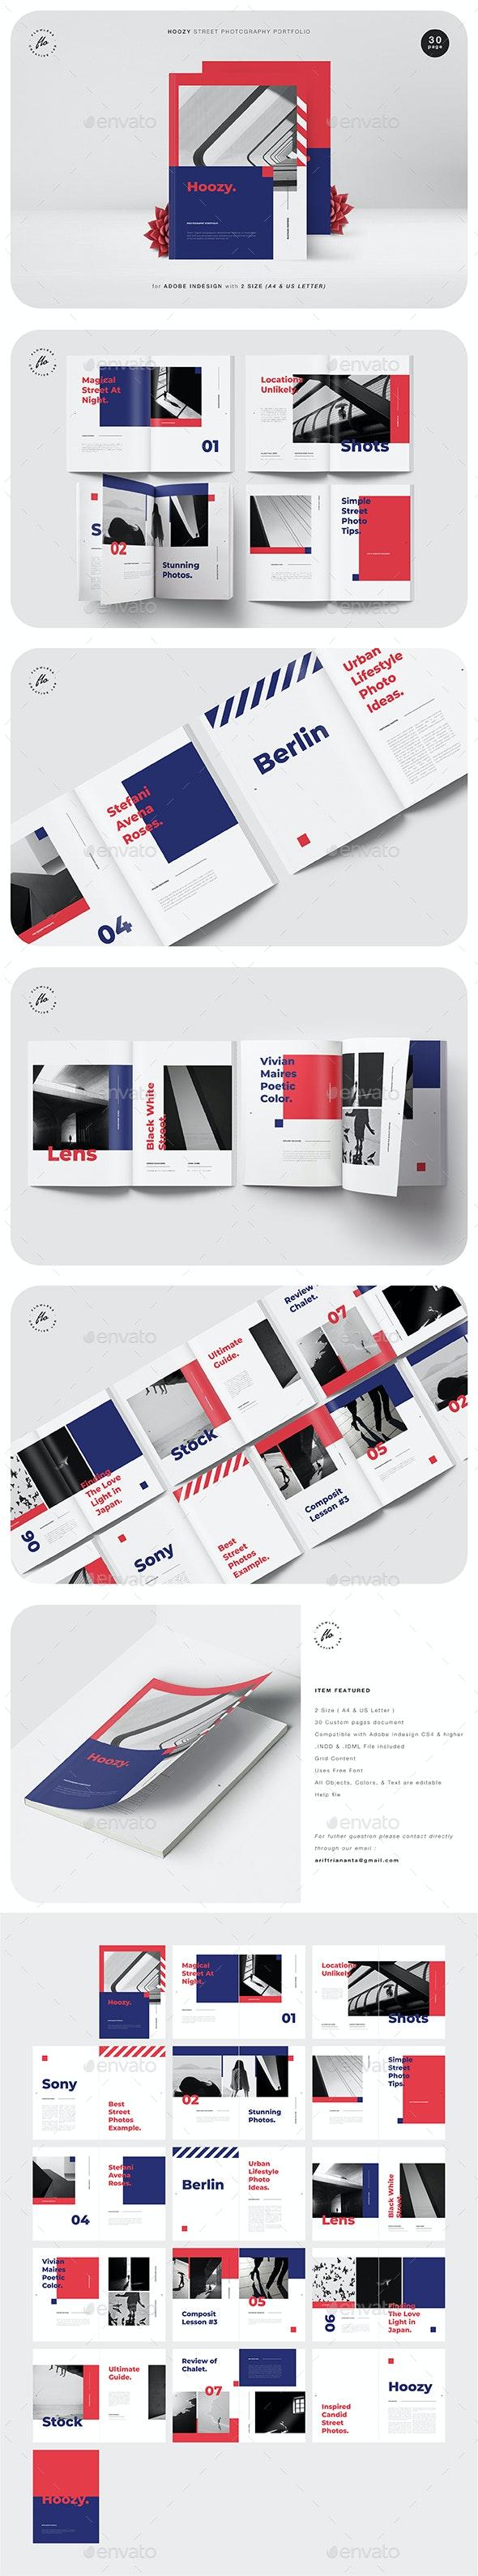 Hoozy Street Photography Portfolio - Magazines Print Templates